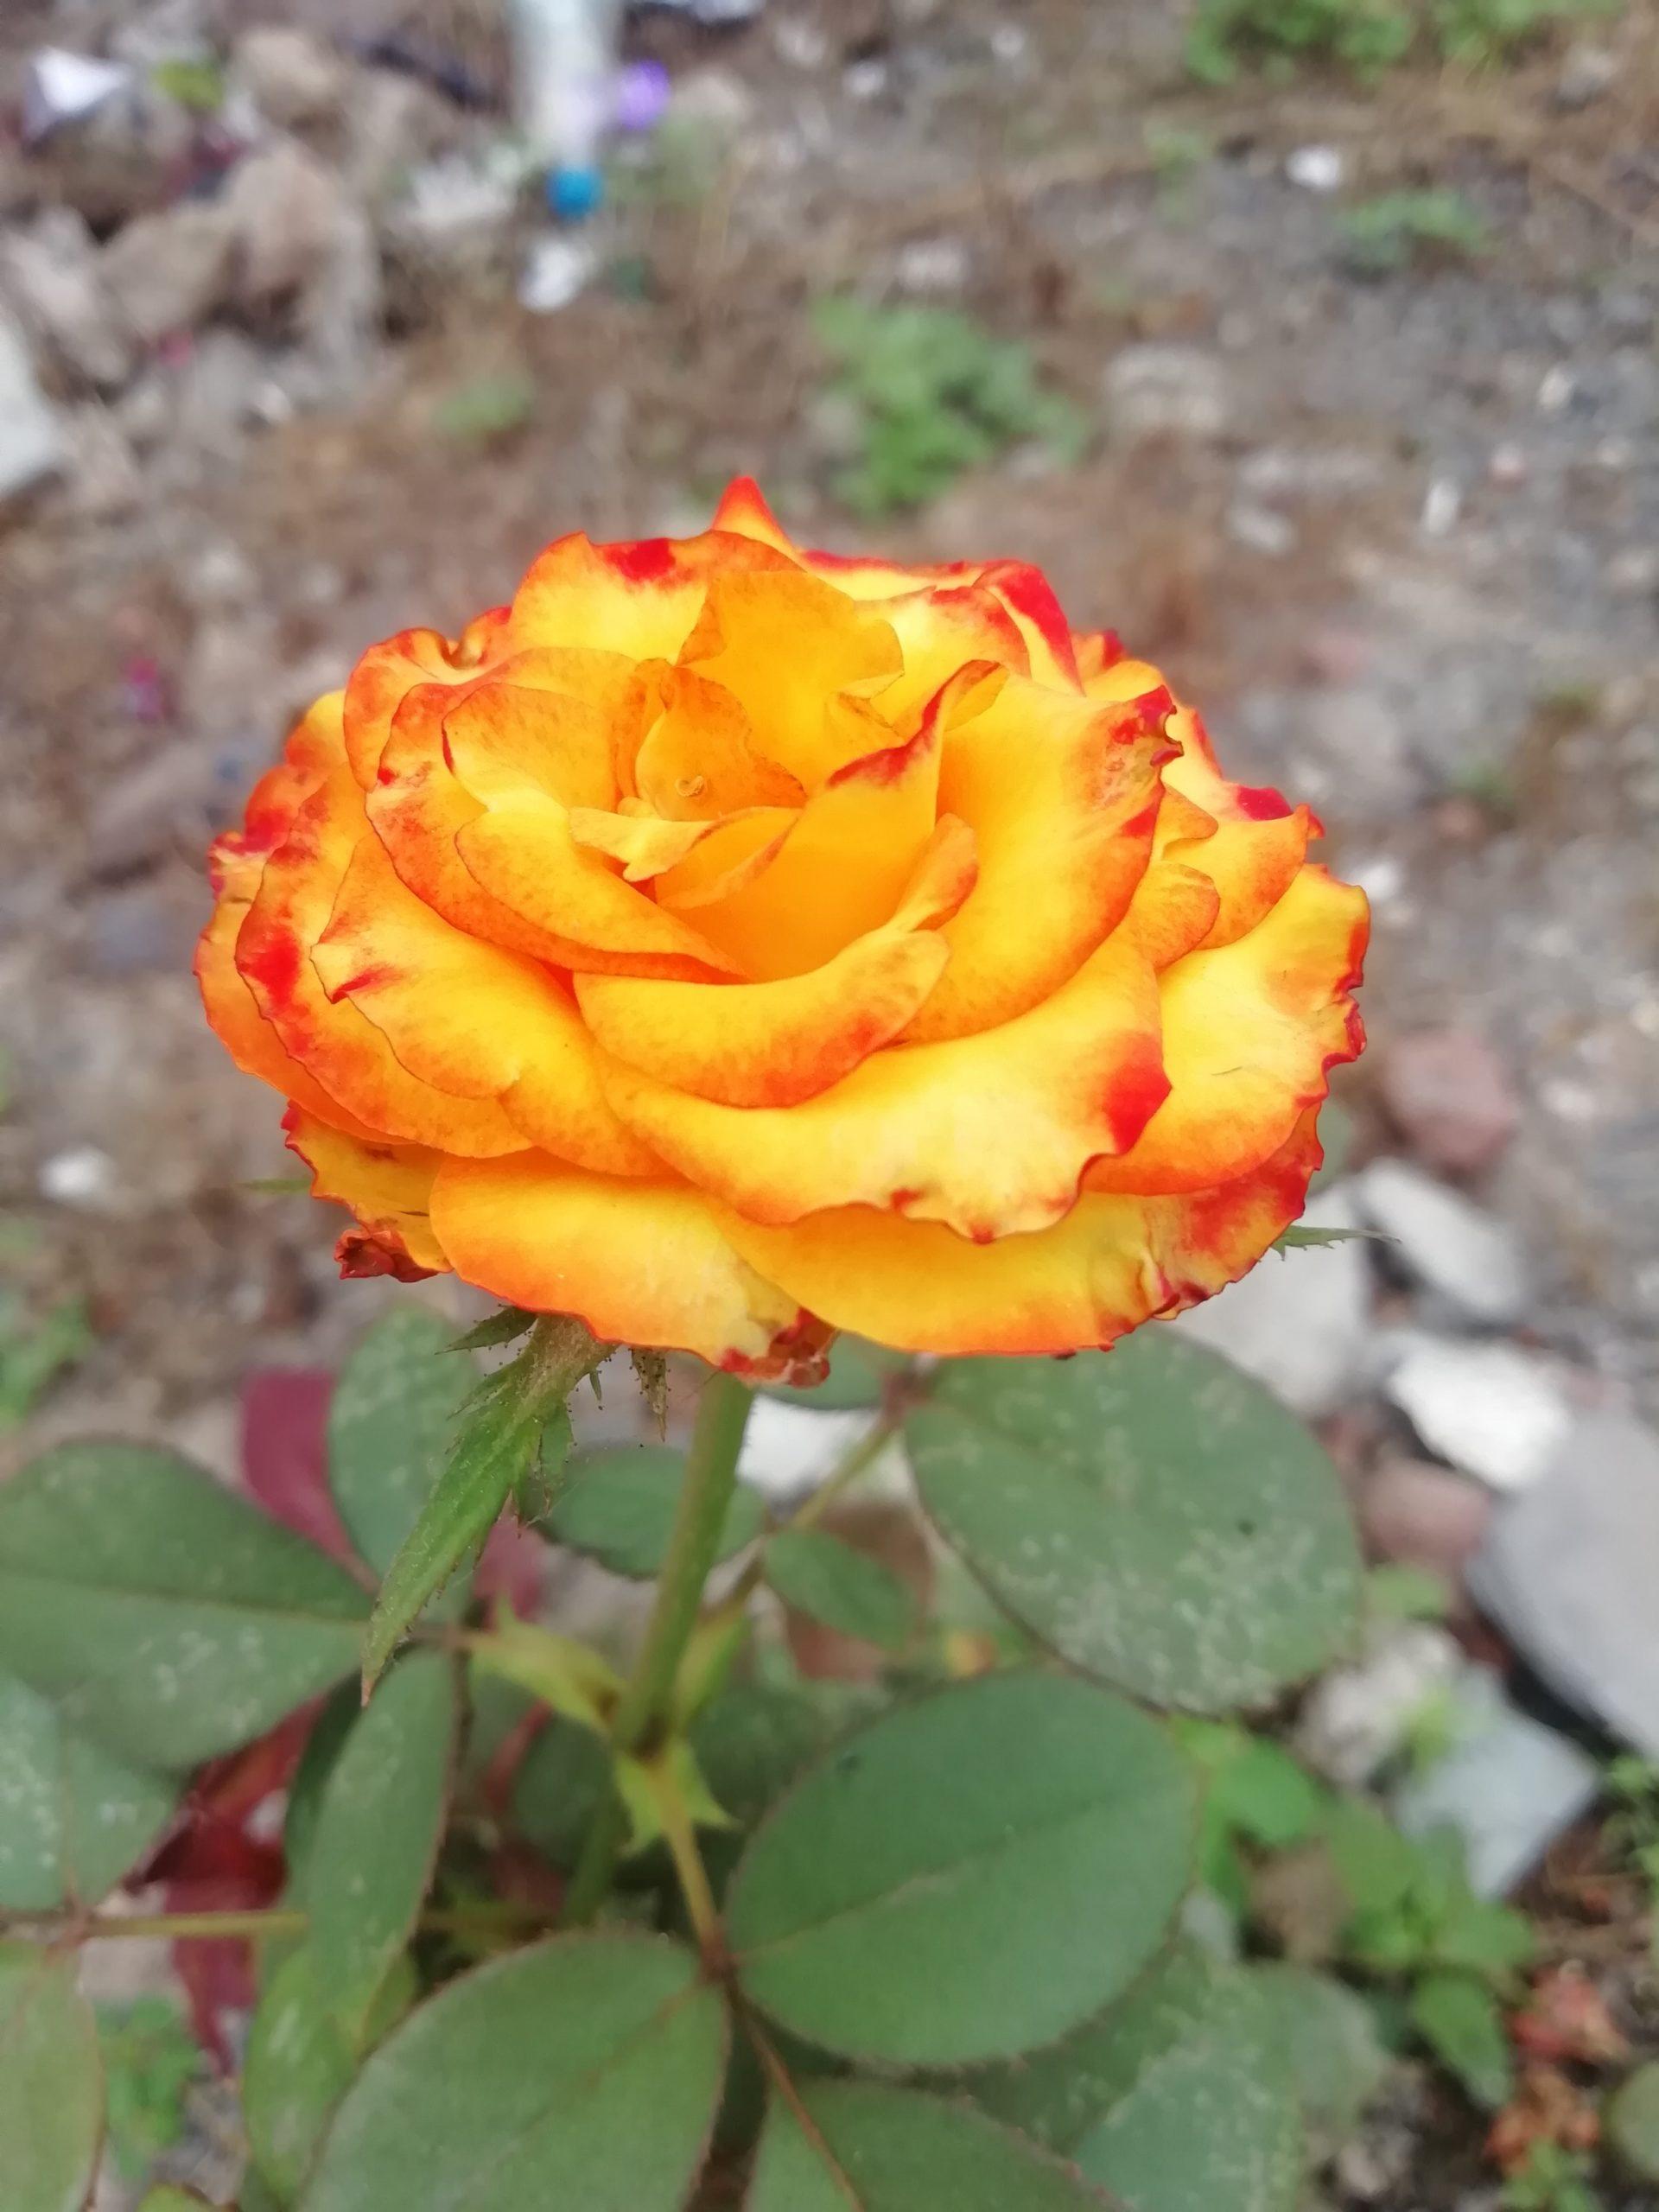 Golden Rose on Focus